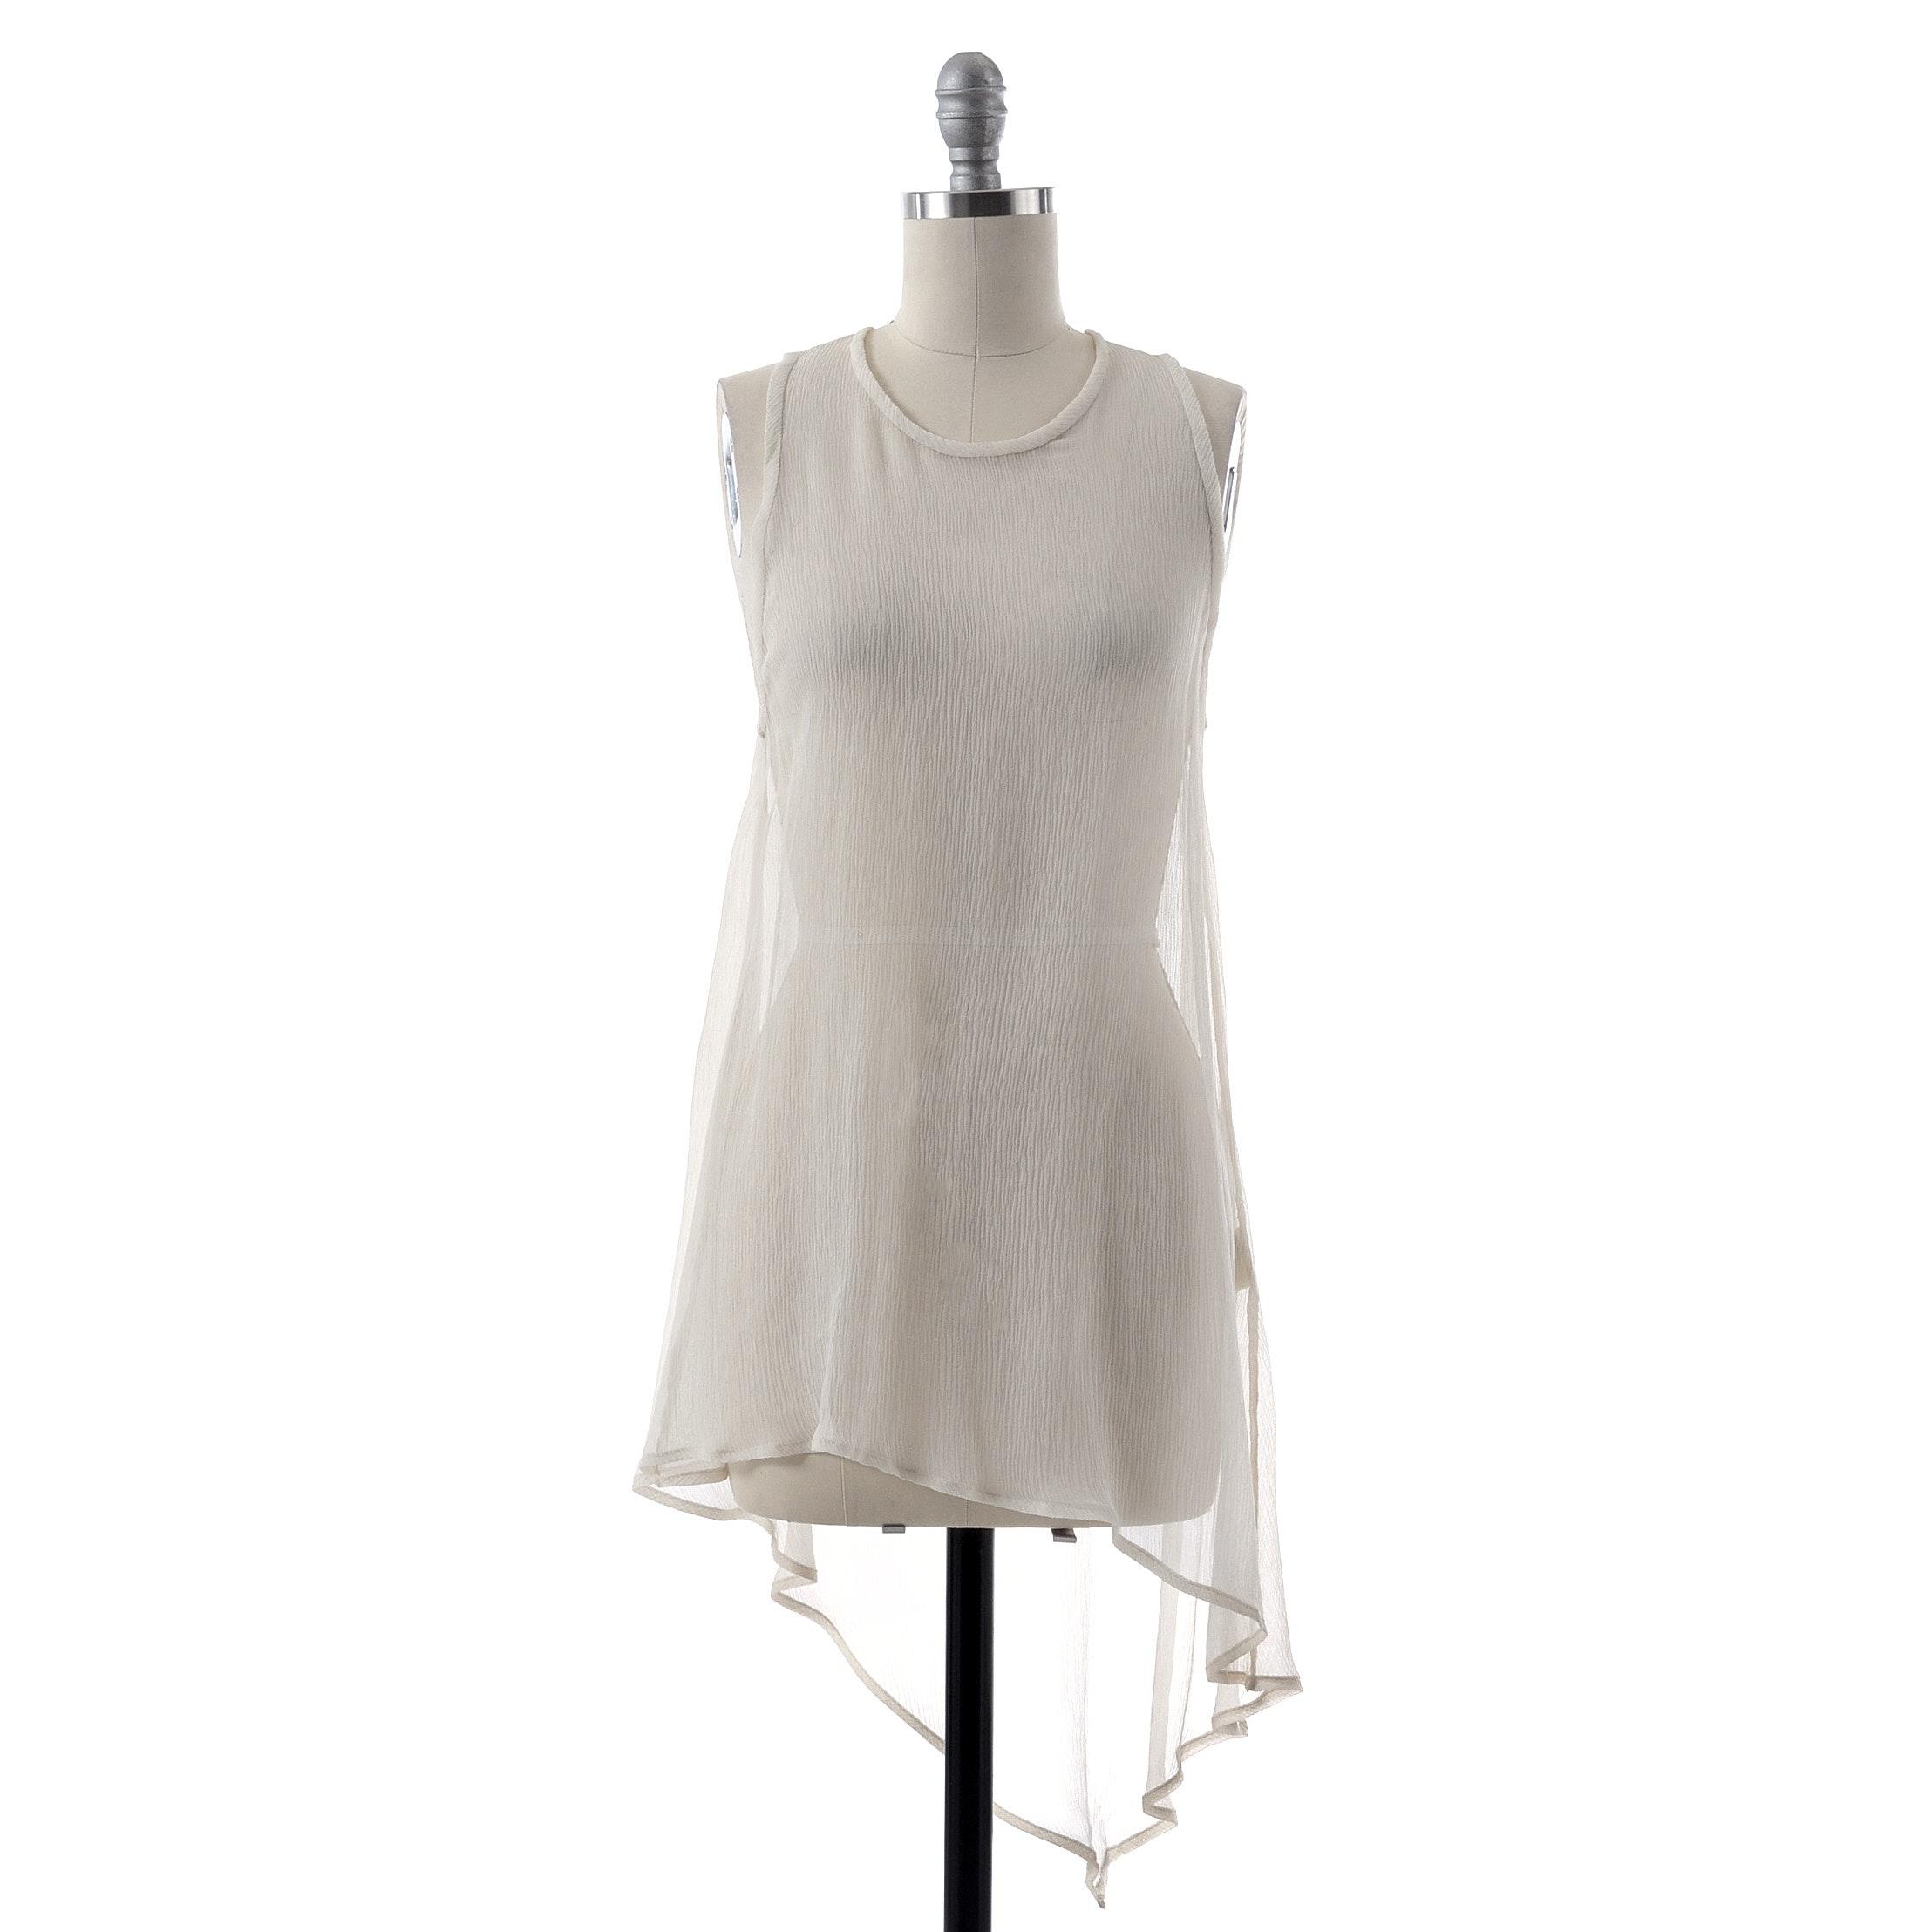 3.1 Philip Lim Ivory Silk Chiffon Sleeveless Asymmetric Tunic